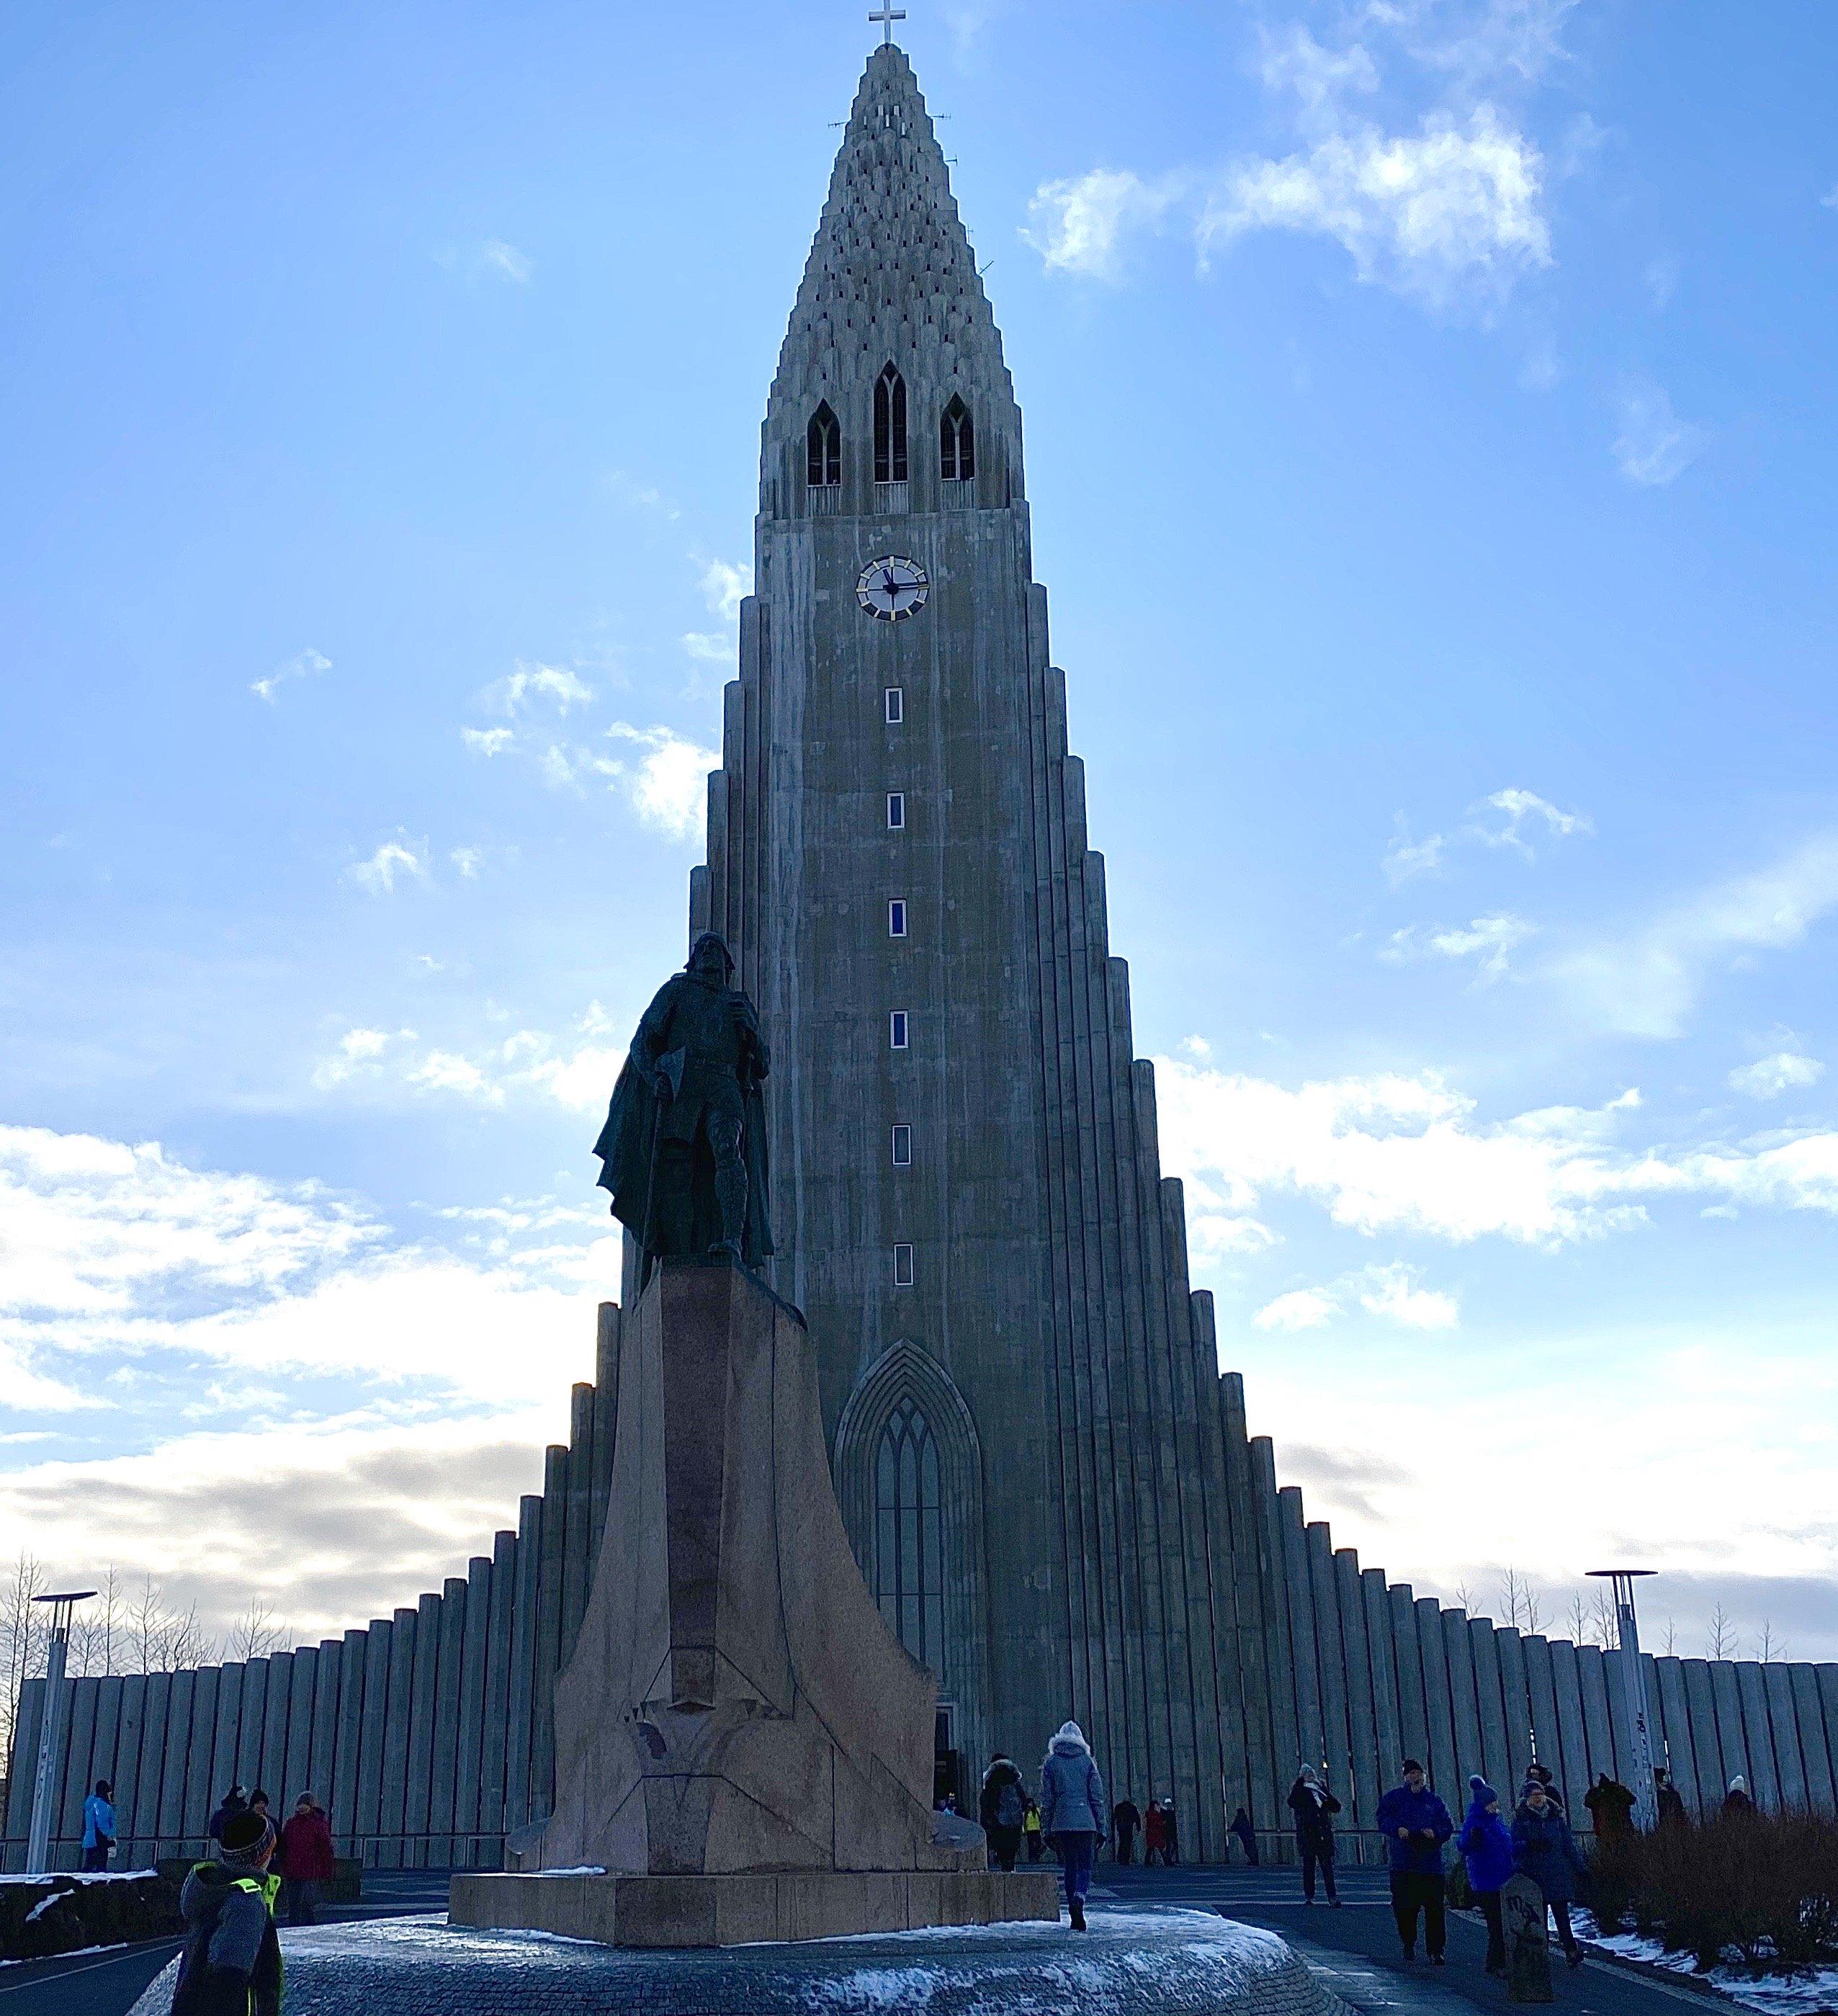 Hallgrimskirkja cathedral in Reykjavik